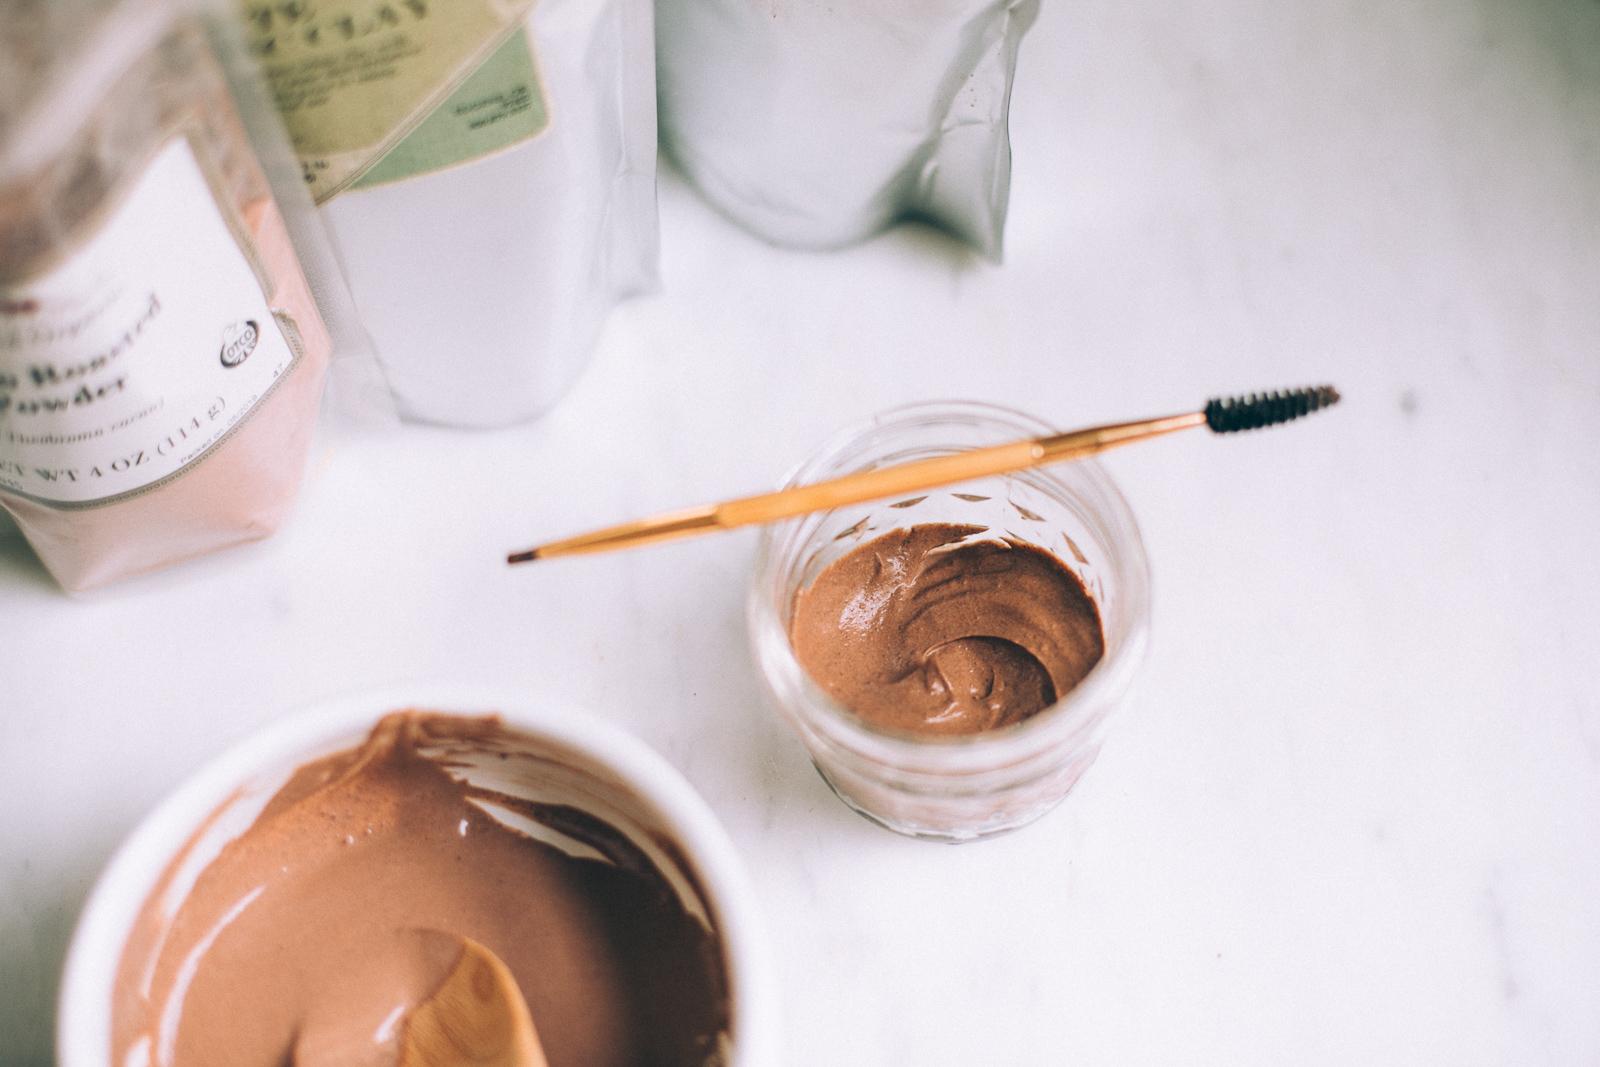 natural eyebrow gel DIY with aloe vera, honey and clay via willfrolicforfood.com